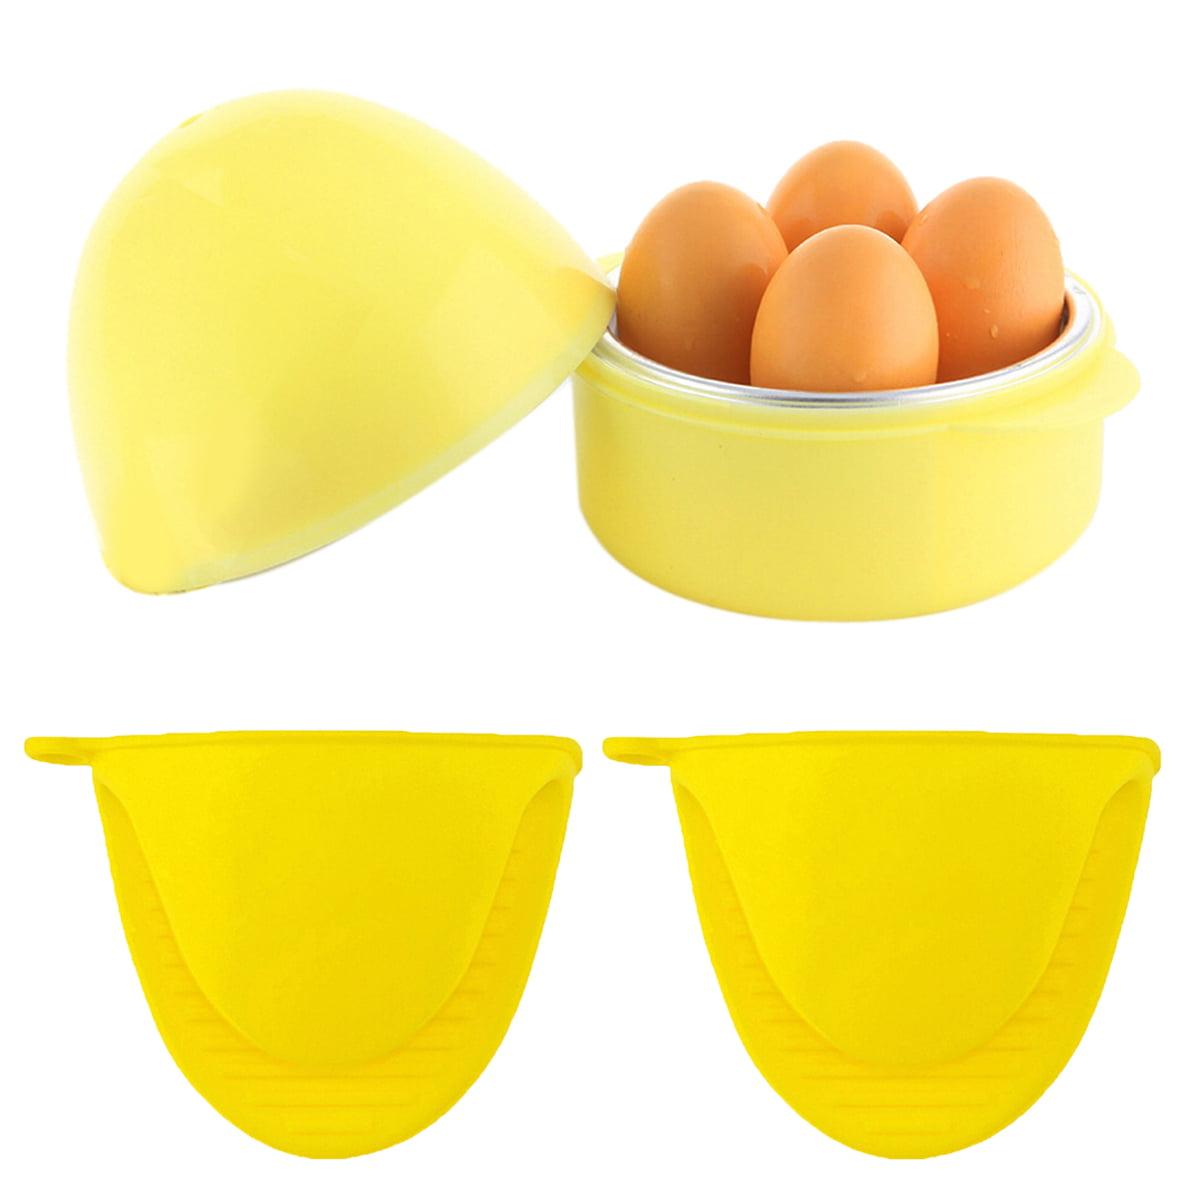 Egg Steamer,Justdolife Easy 4-Egg Microwave Boiler Rapid Eggs Cooker with Oven Gloves